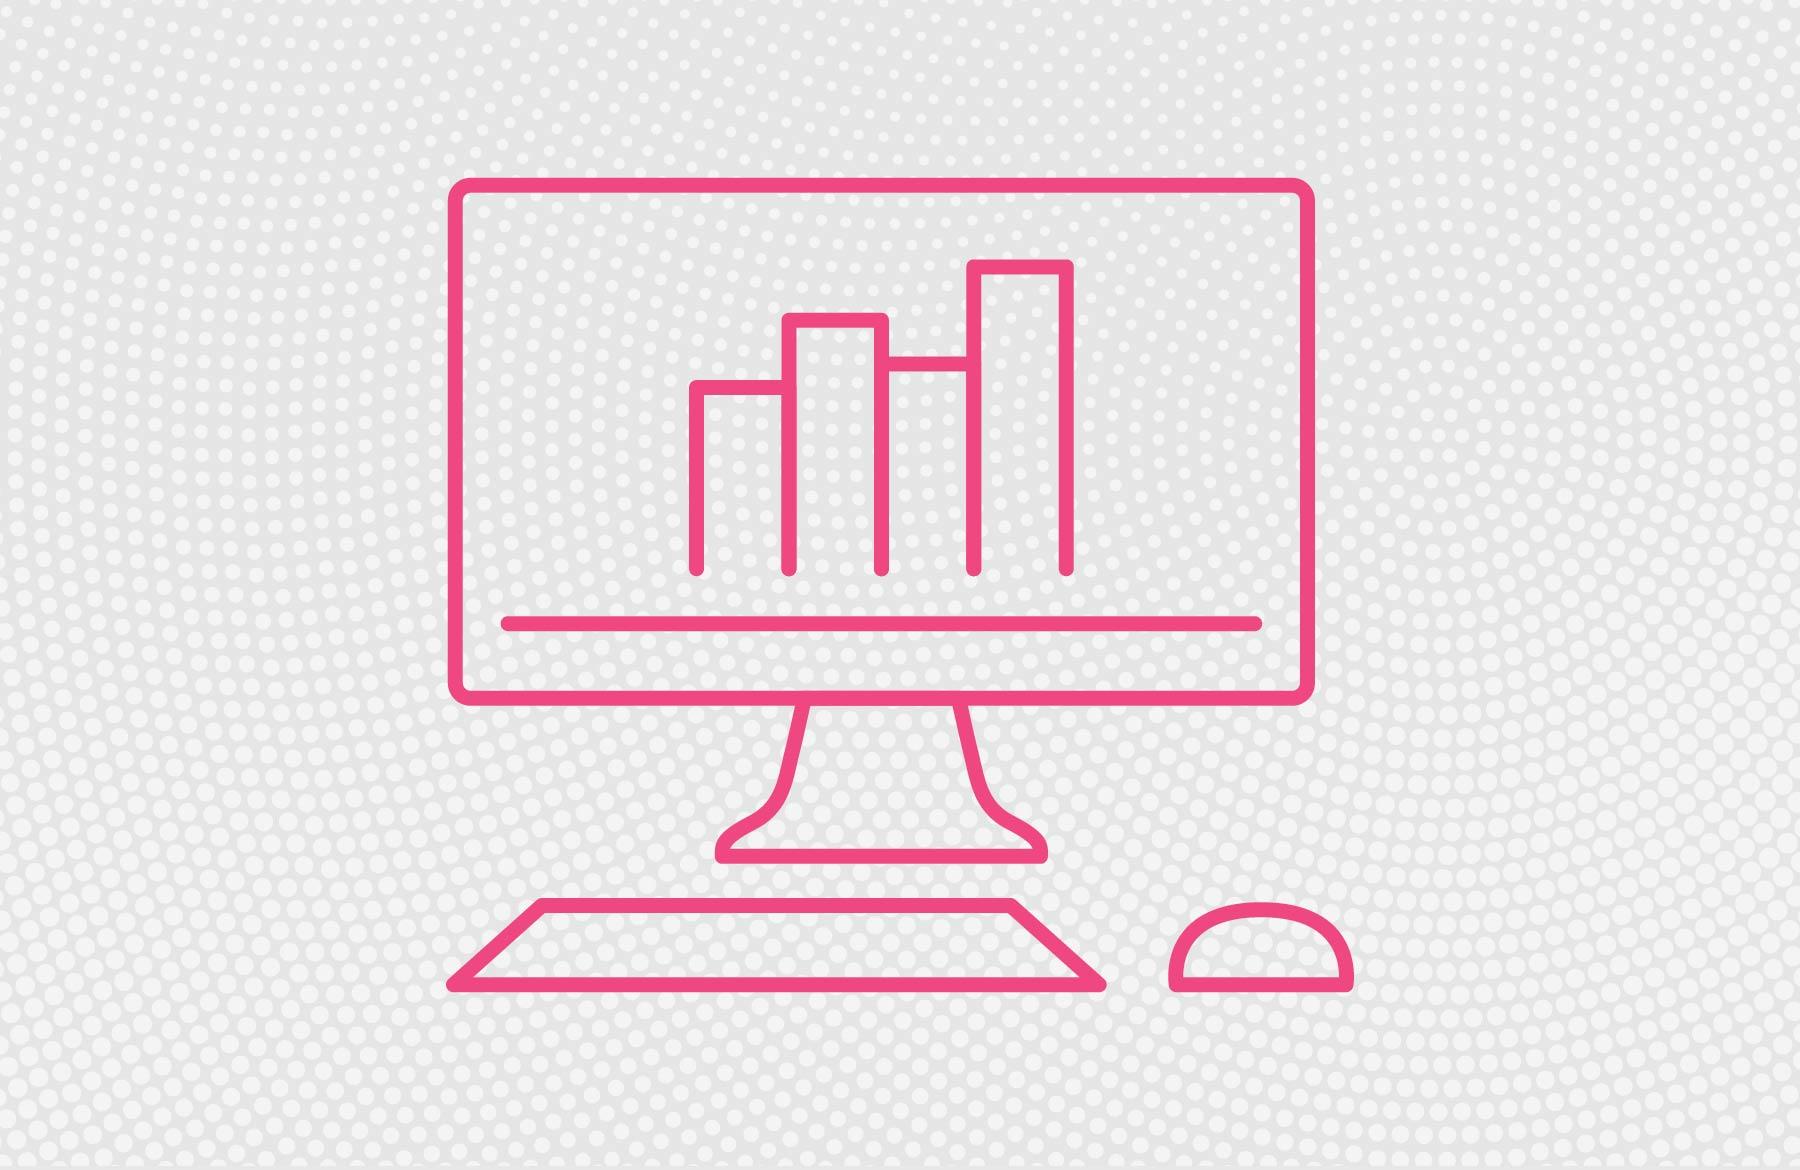 Simple Website Optimizations to Grow Your Sales (Part III)